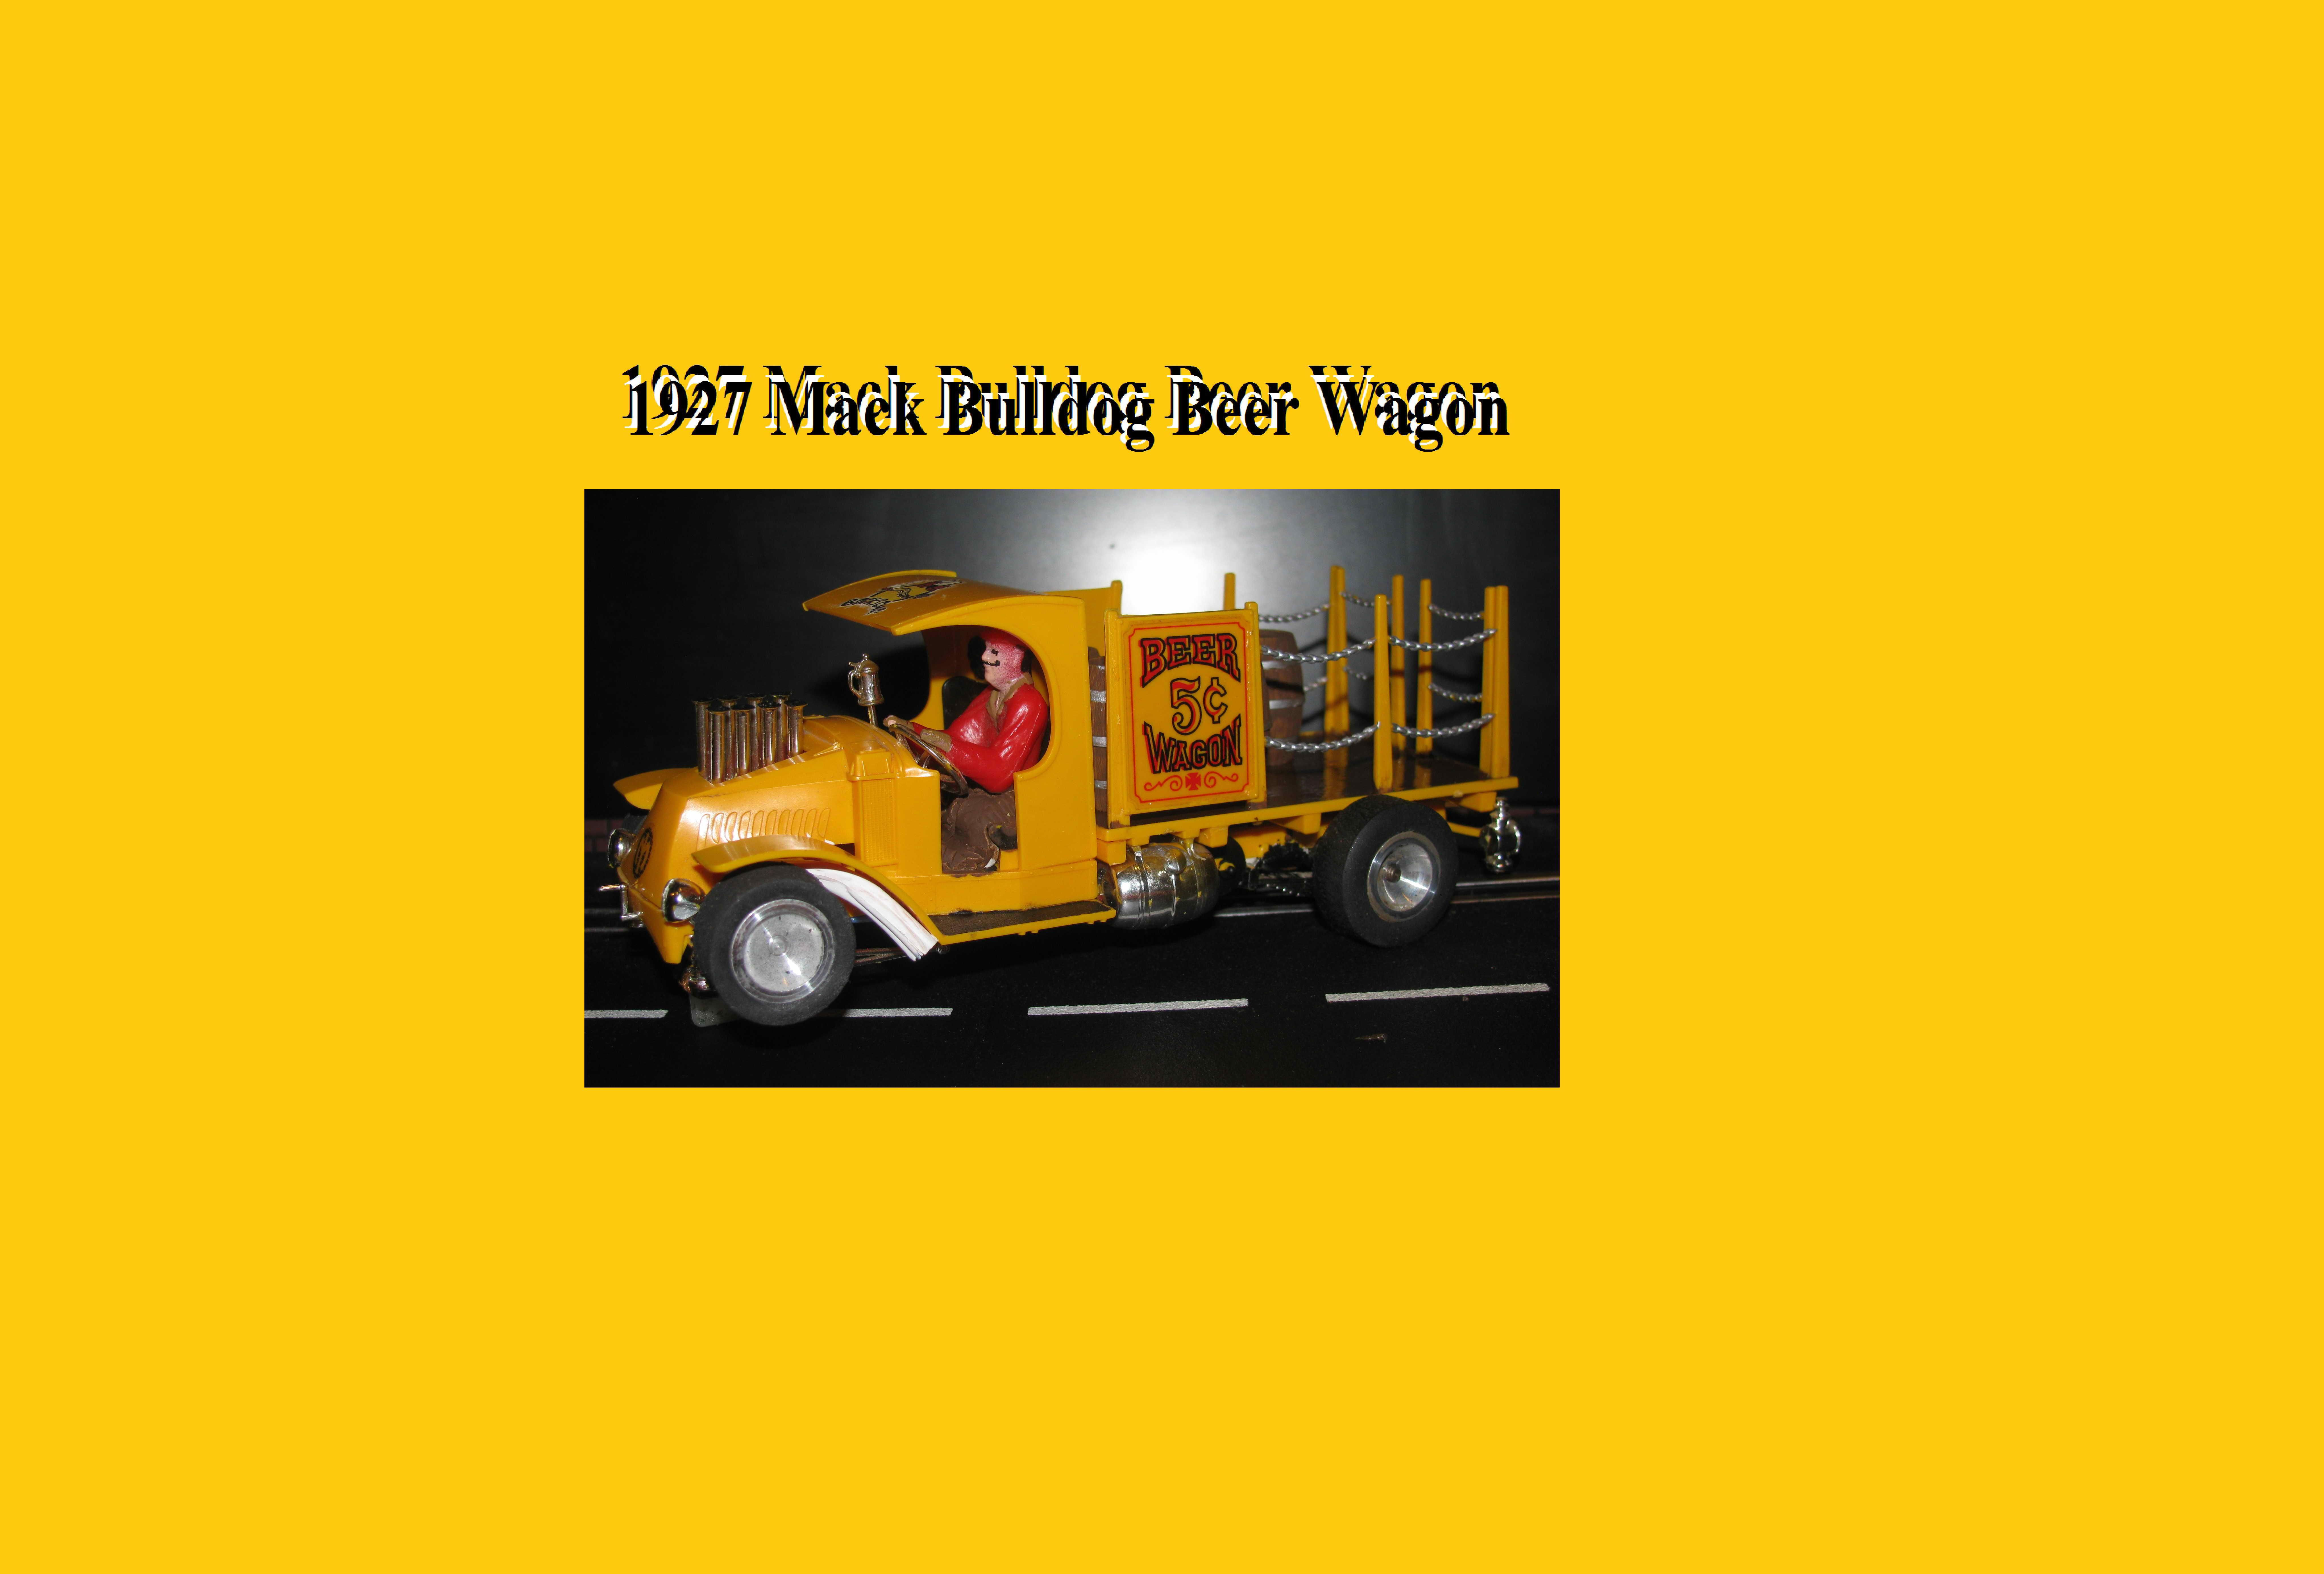 Monogram 1927 Mack Bulldog Beer Wagon